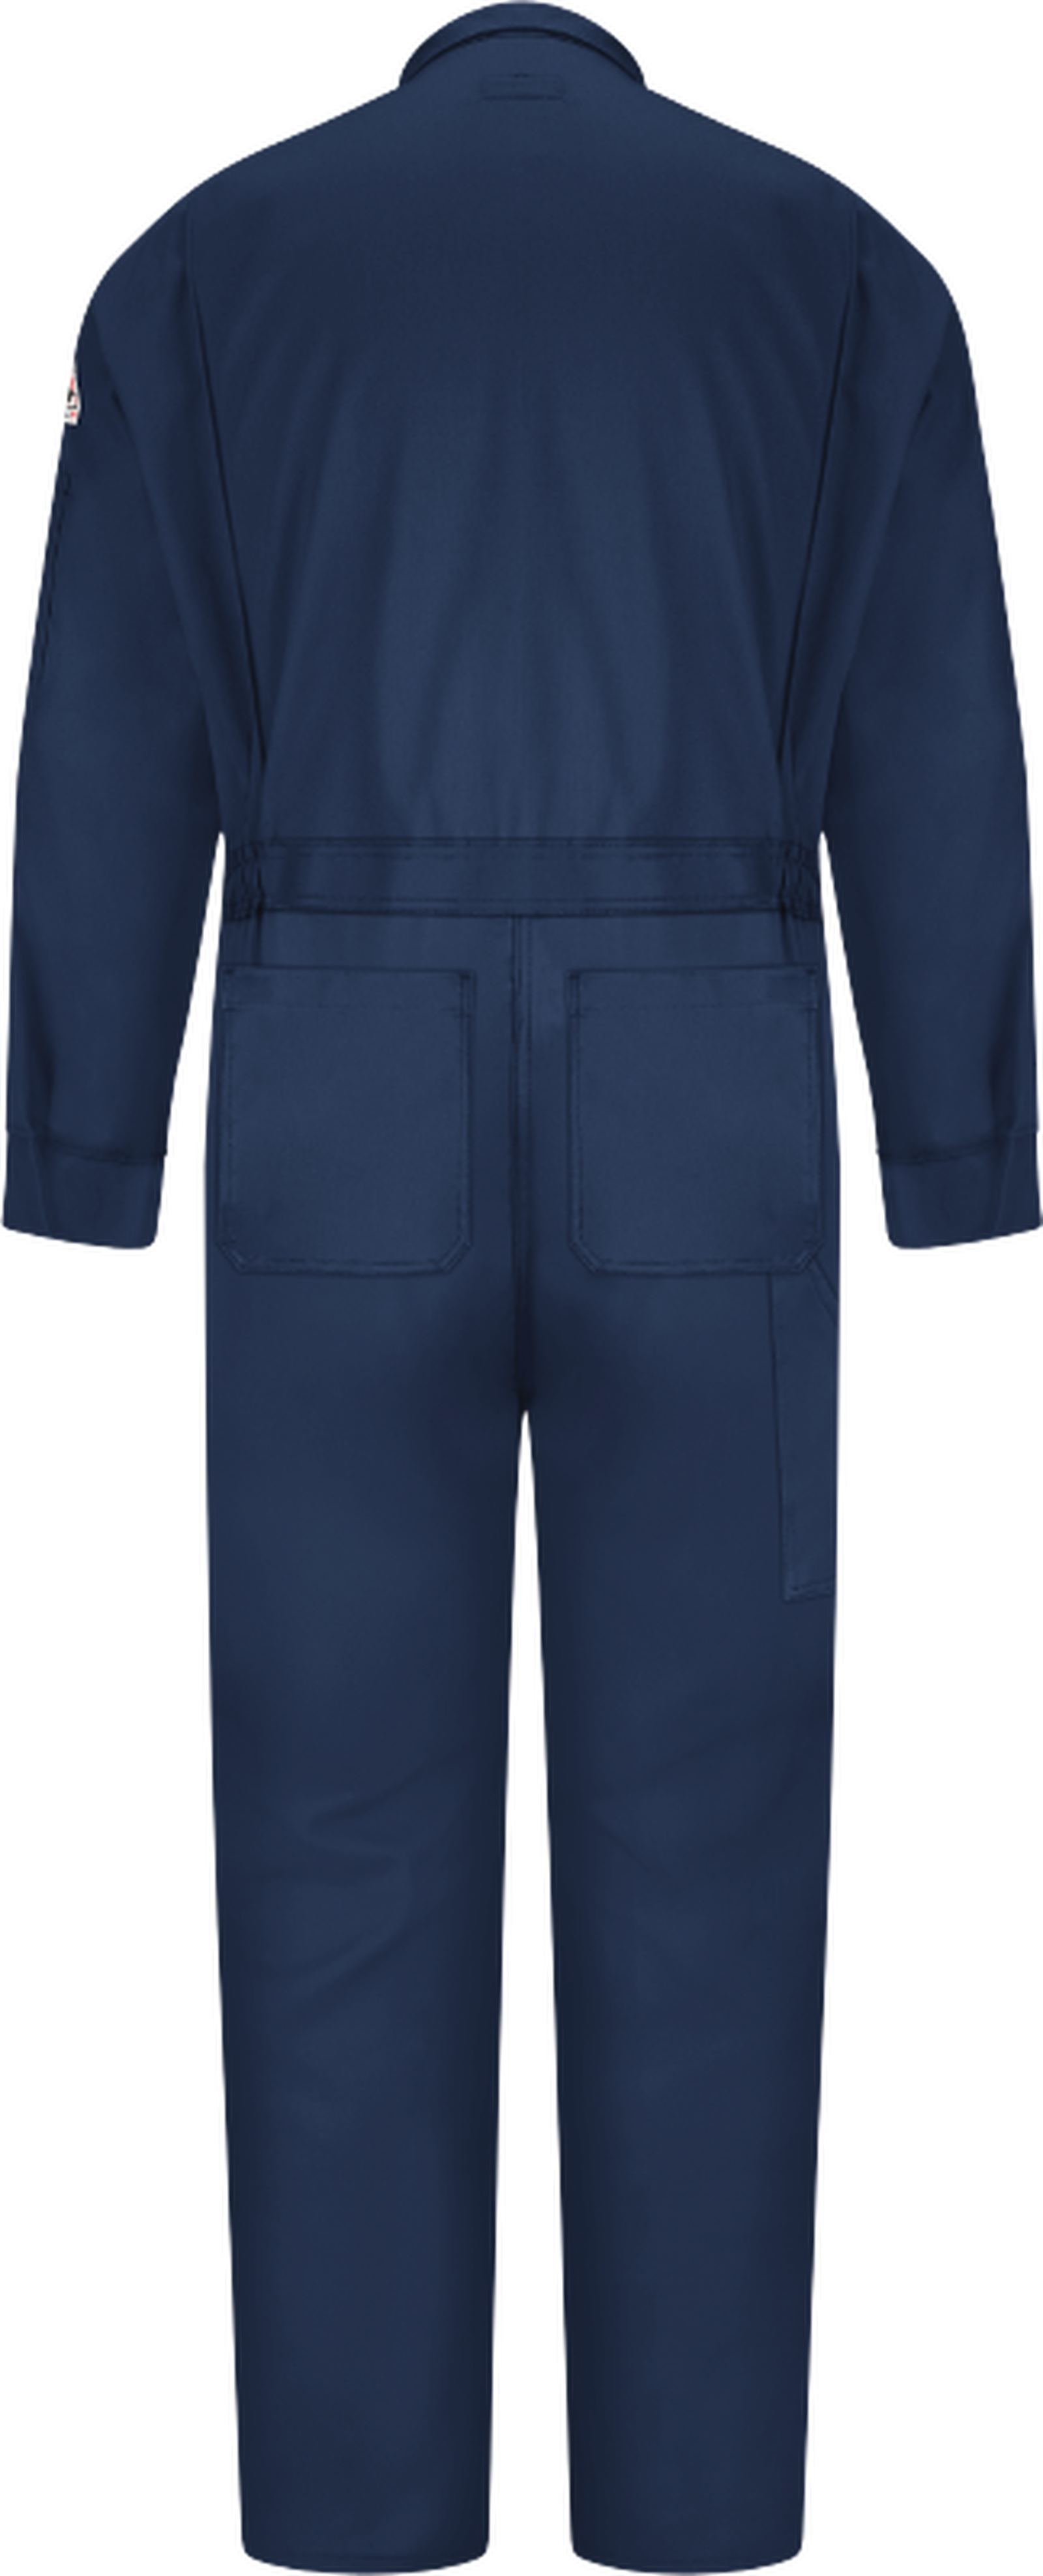 Men's Lightweight Nomex FR Premium Coverall